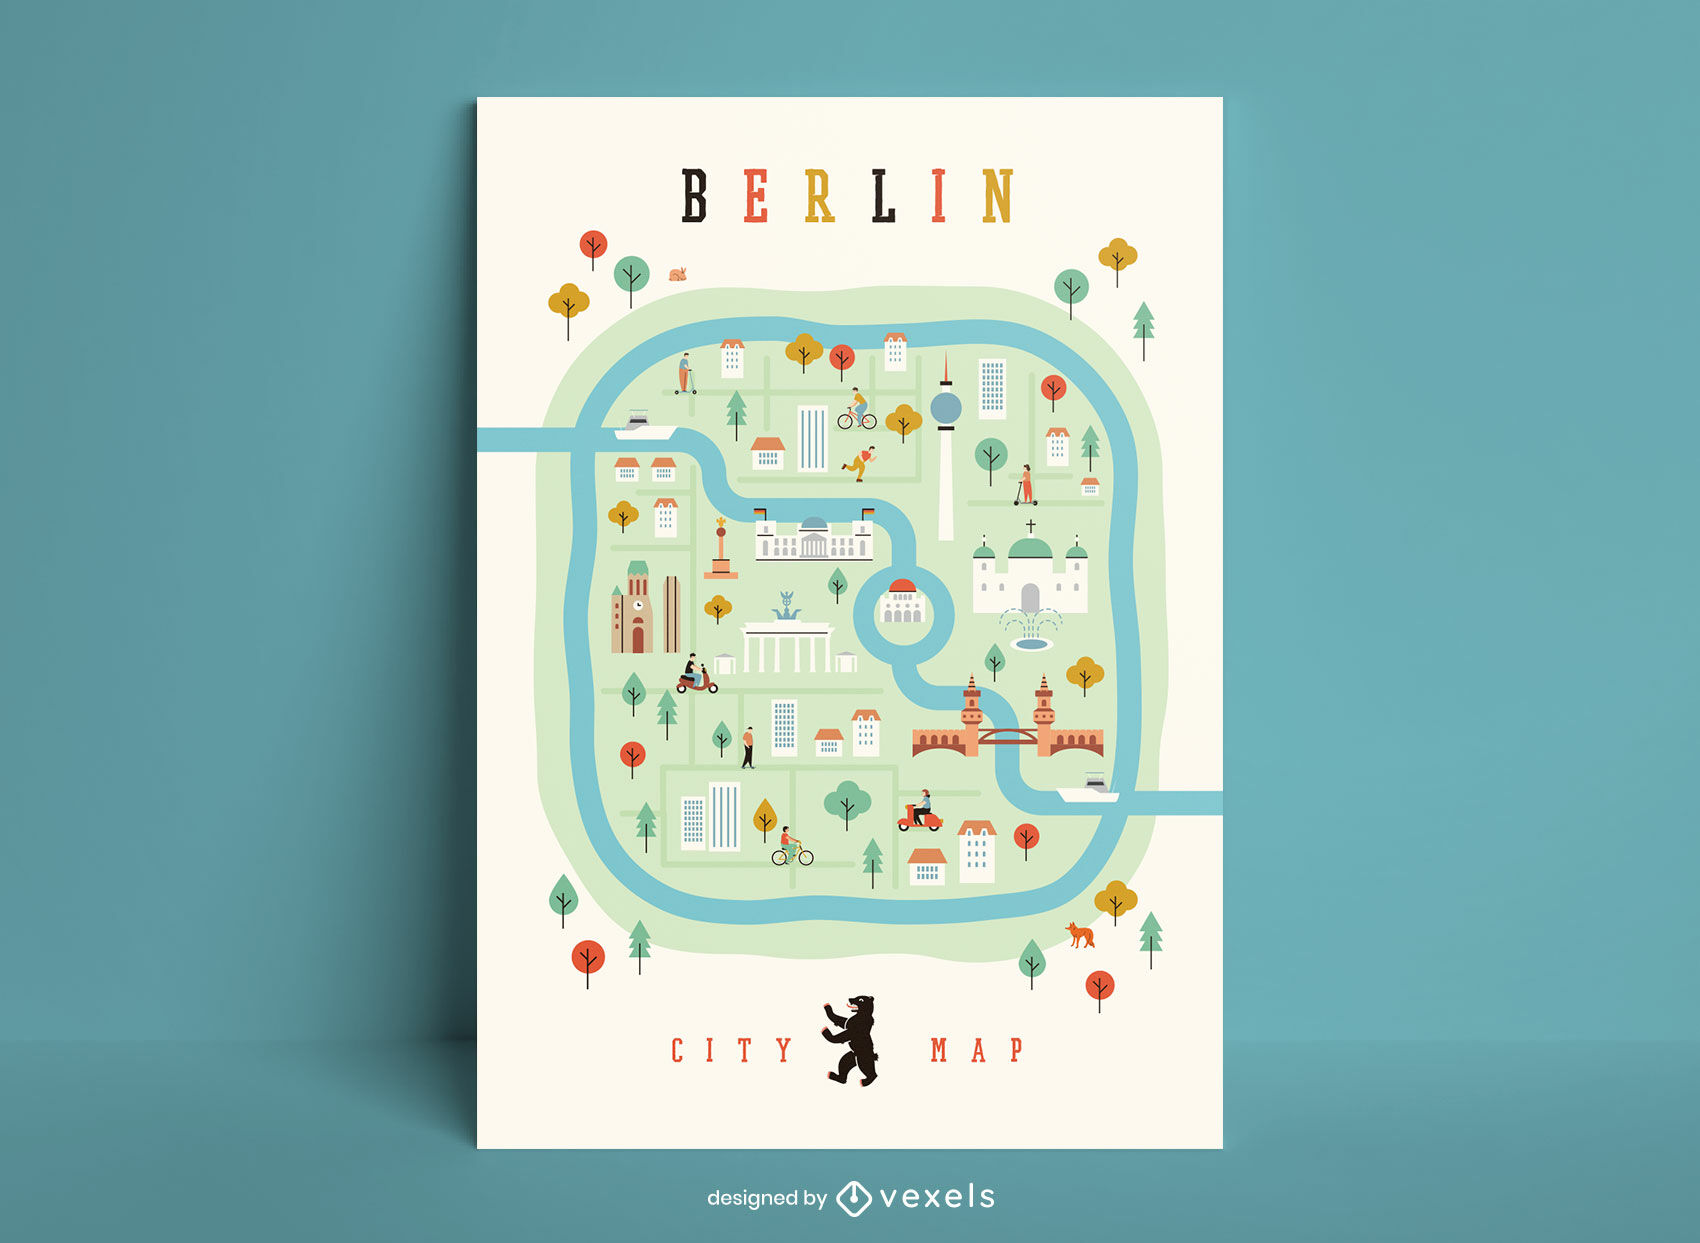 Berlin city map poster template